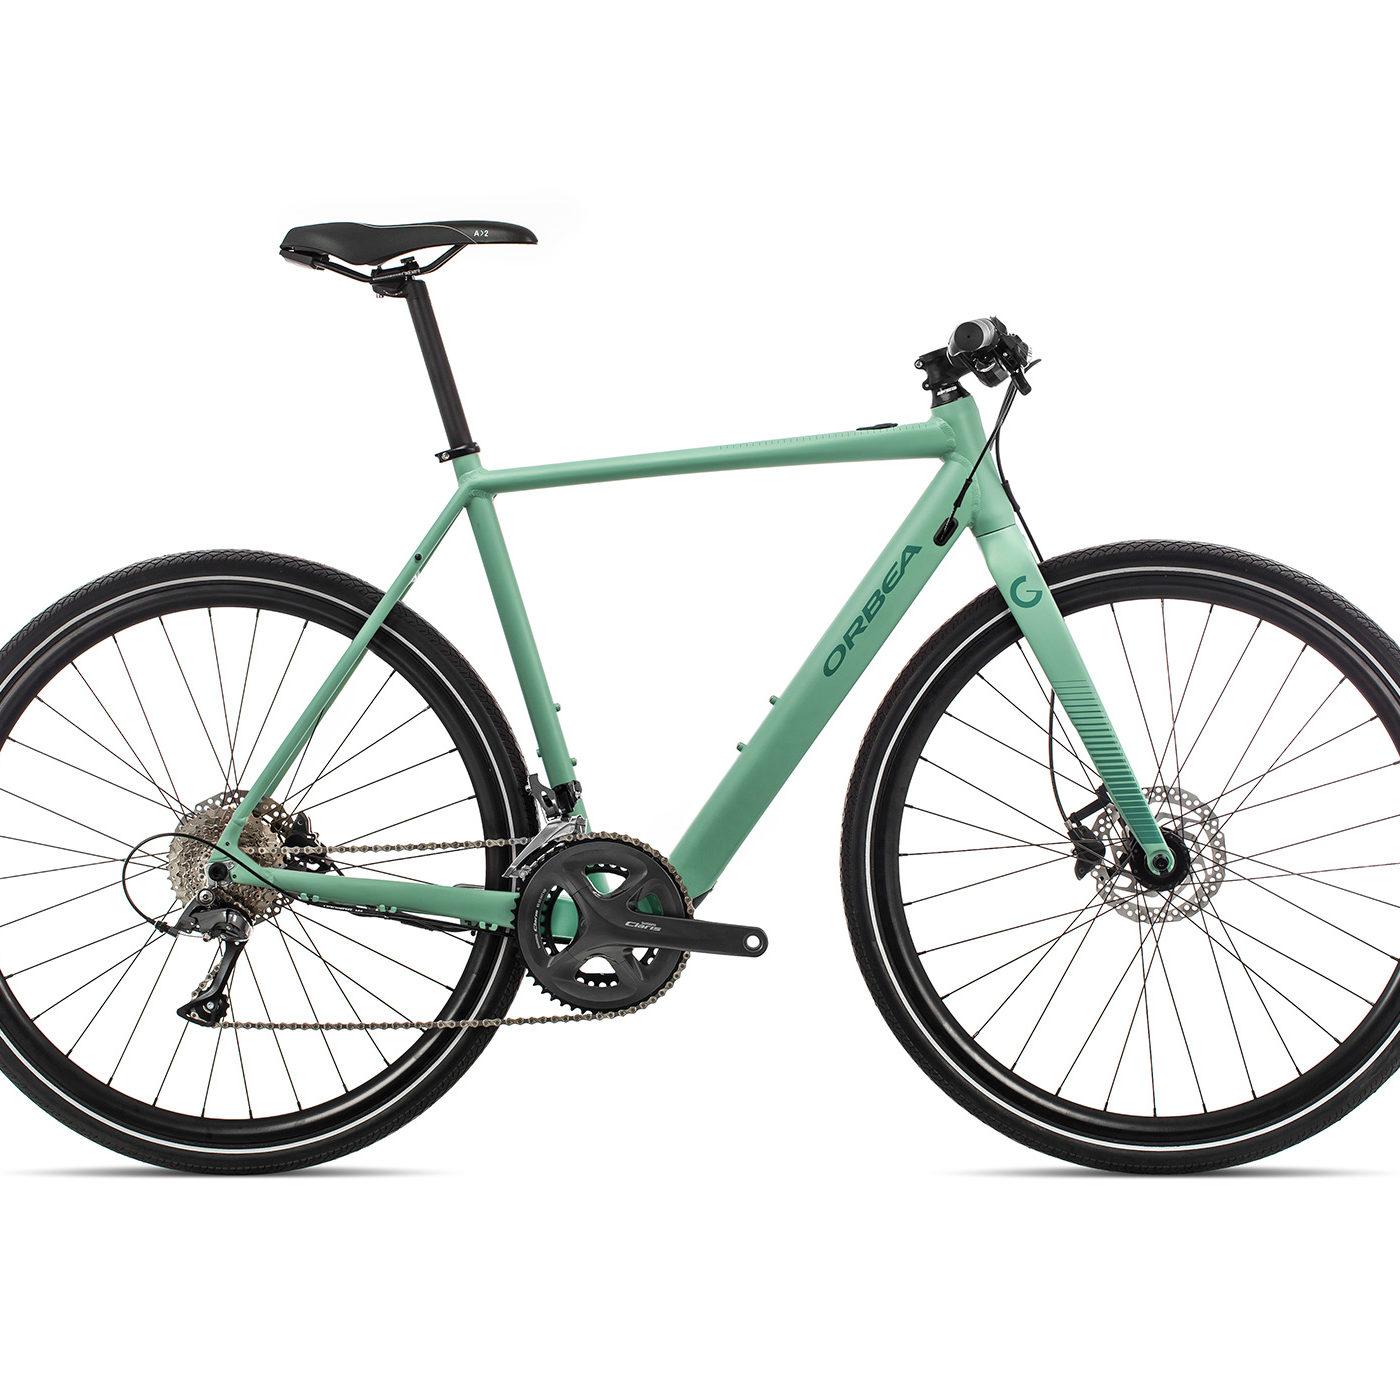 Orbea Gain F30 - Groen (Dof-Gloss)